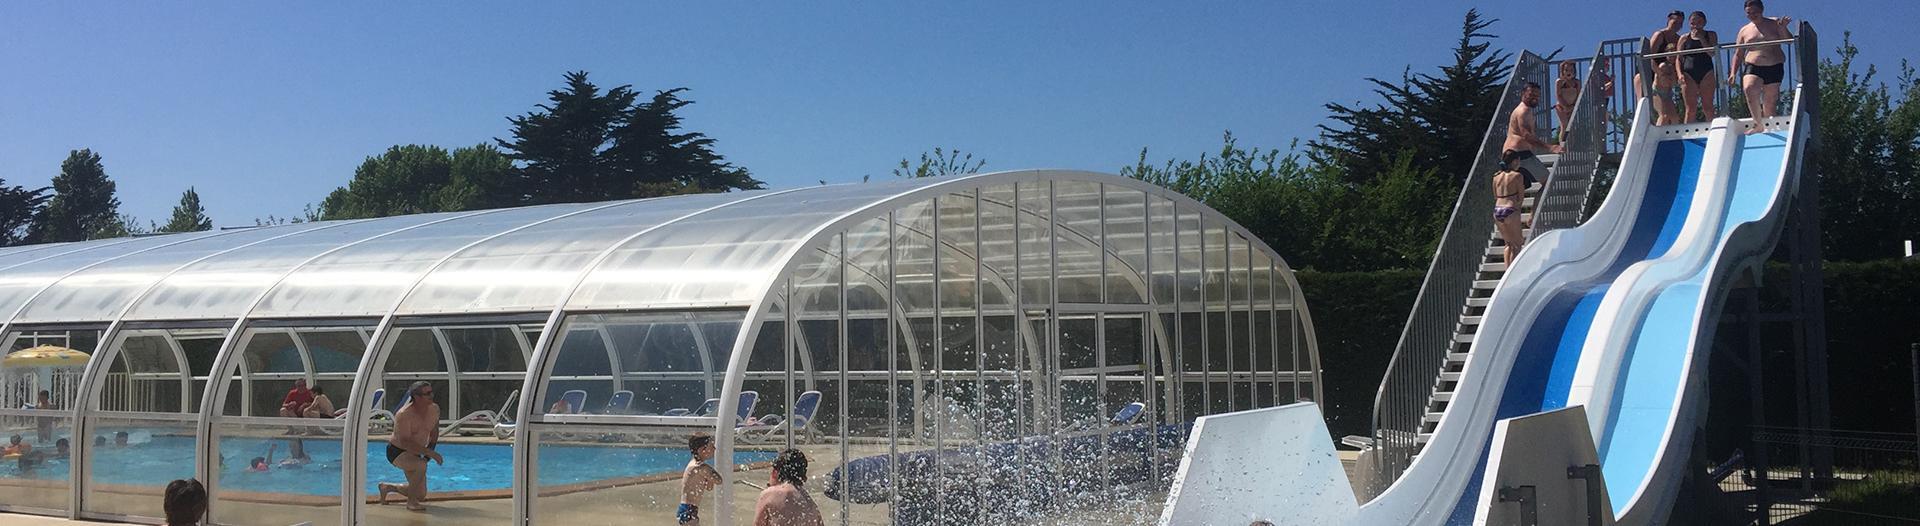 slider-camping-golf-barneville-piscine-toboggan